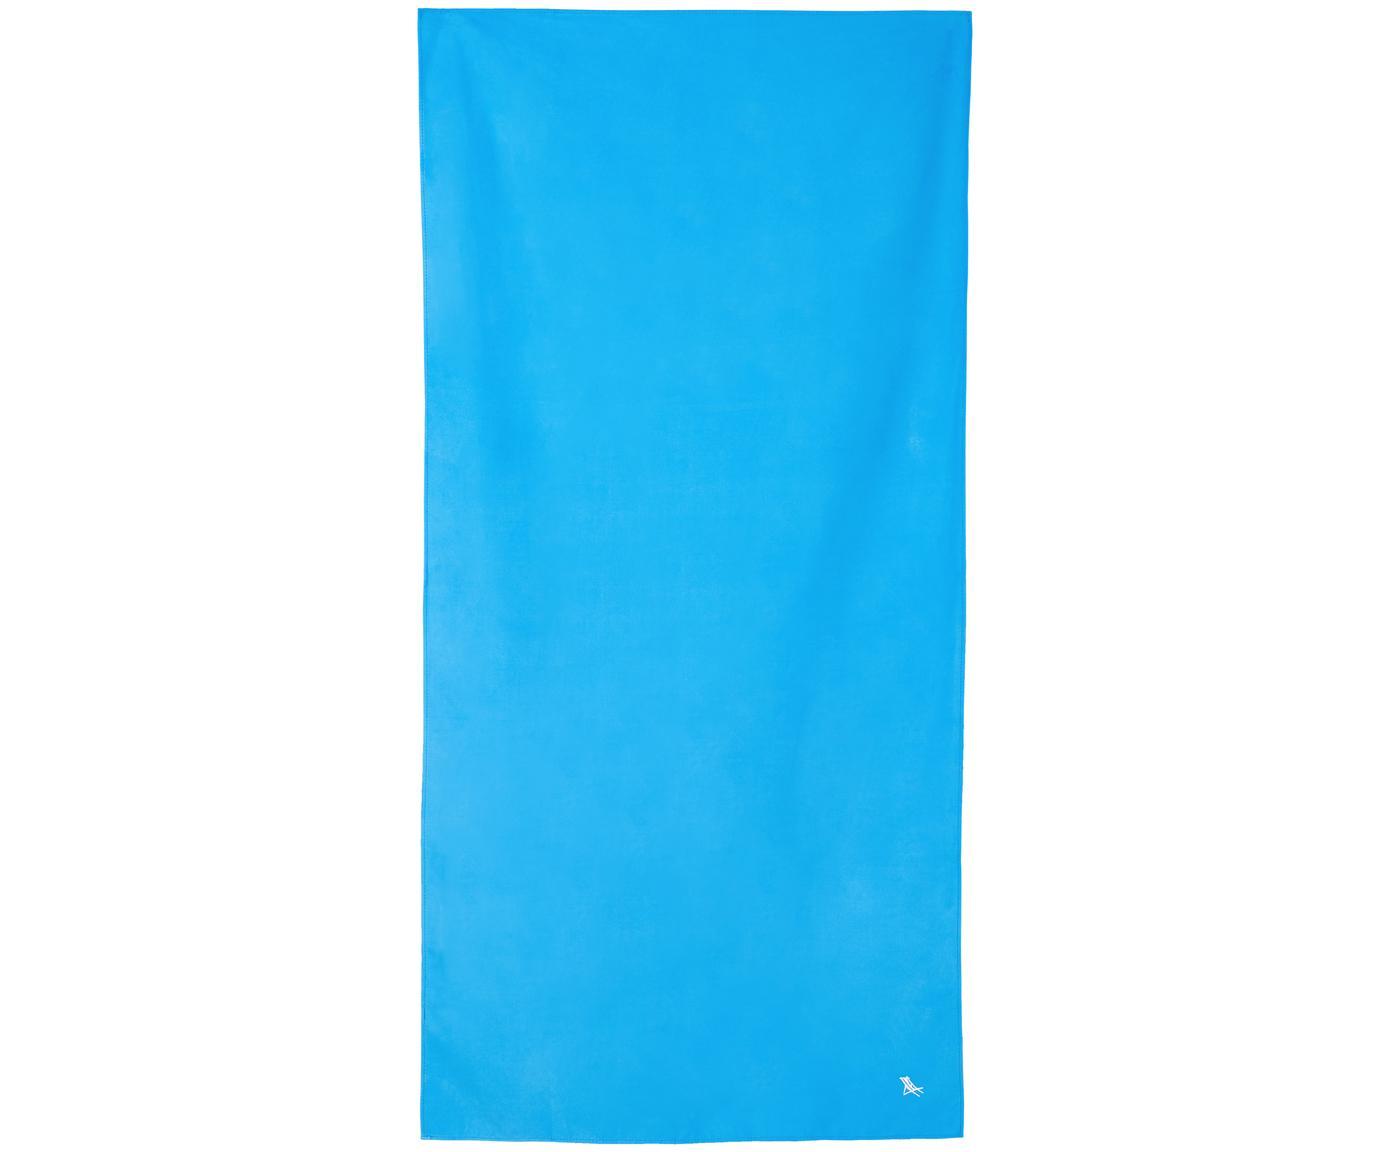 Microvezel strandlaken Classic, sneldrogend, Microvezels (80% polyester, 20% polyamide), Blauw, 90 x 200 cm